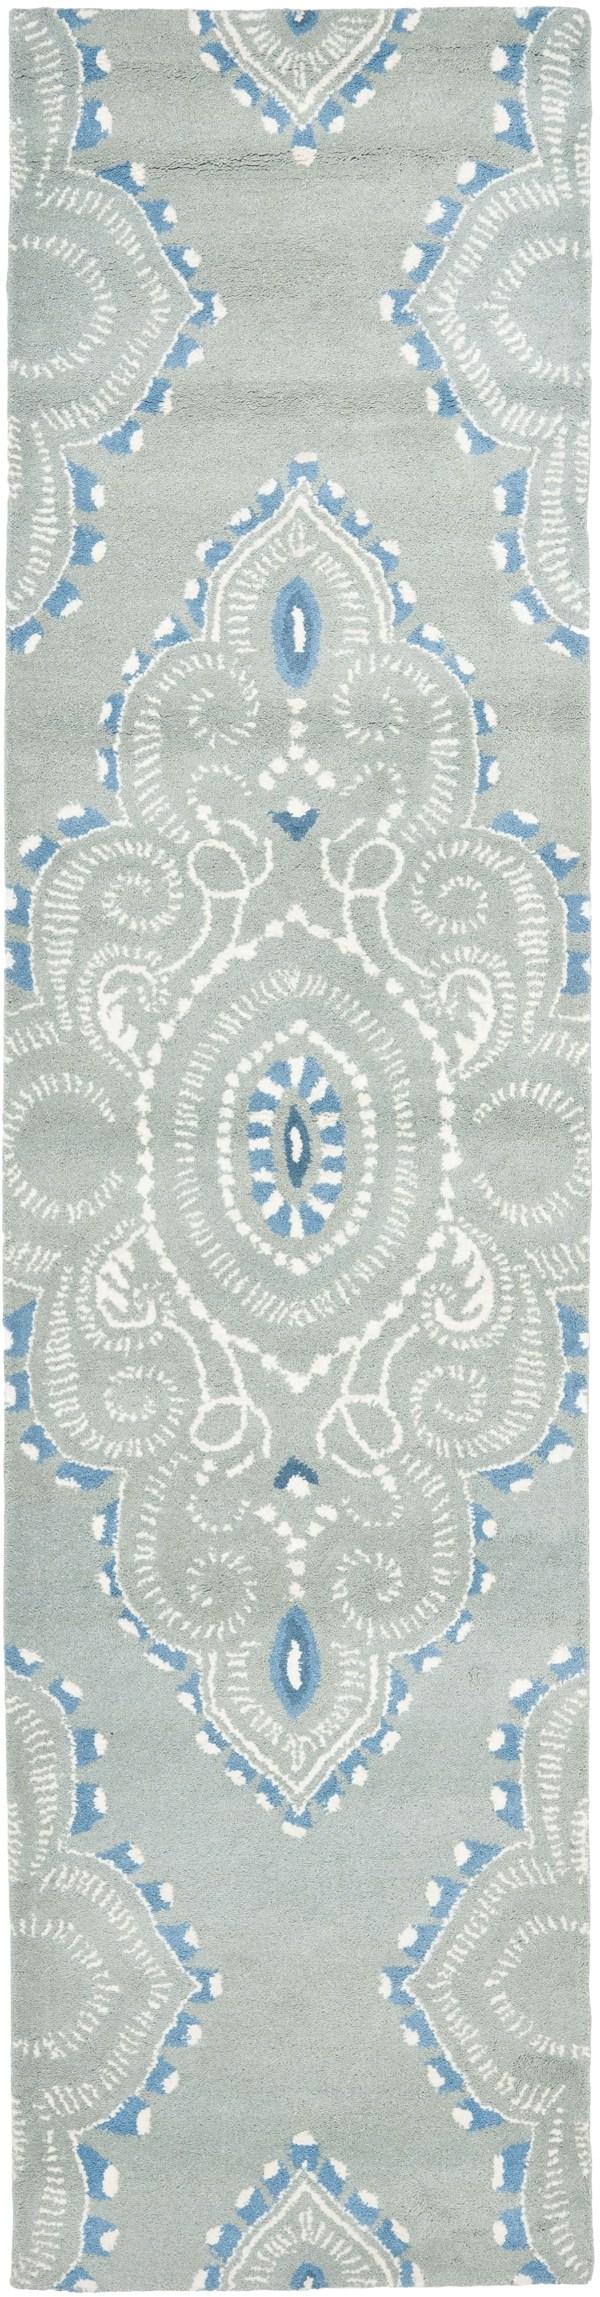 Blue, Ivory (A) Damask Area Rug